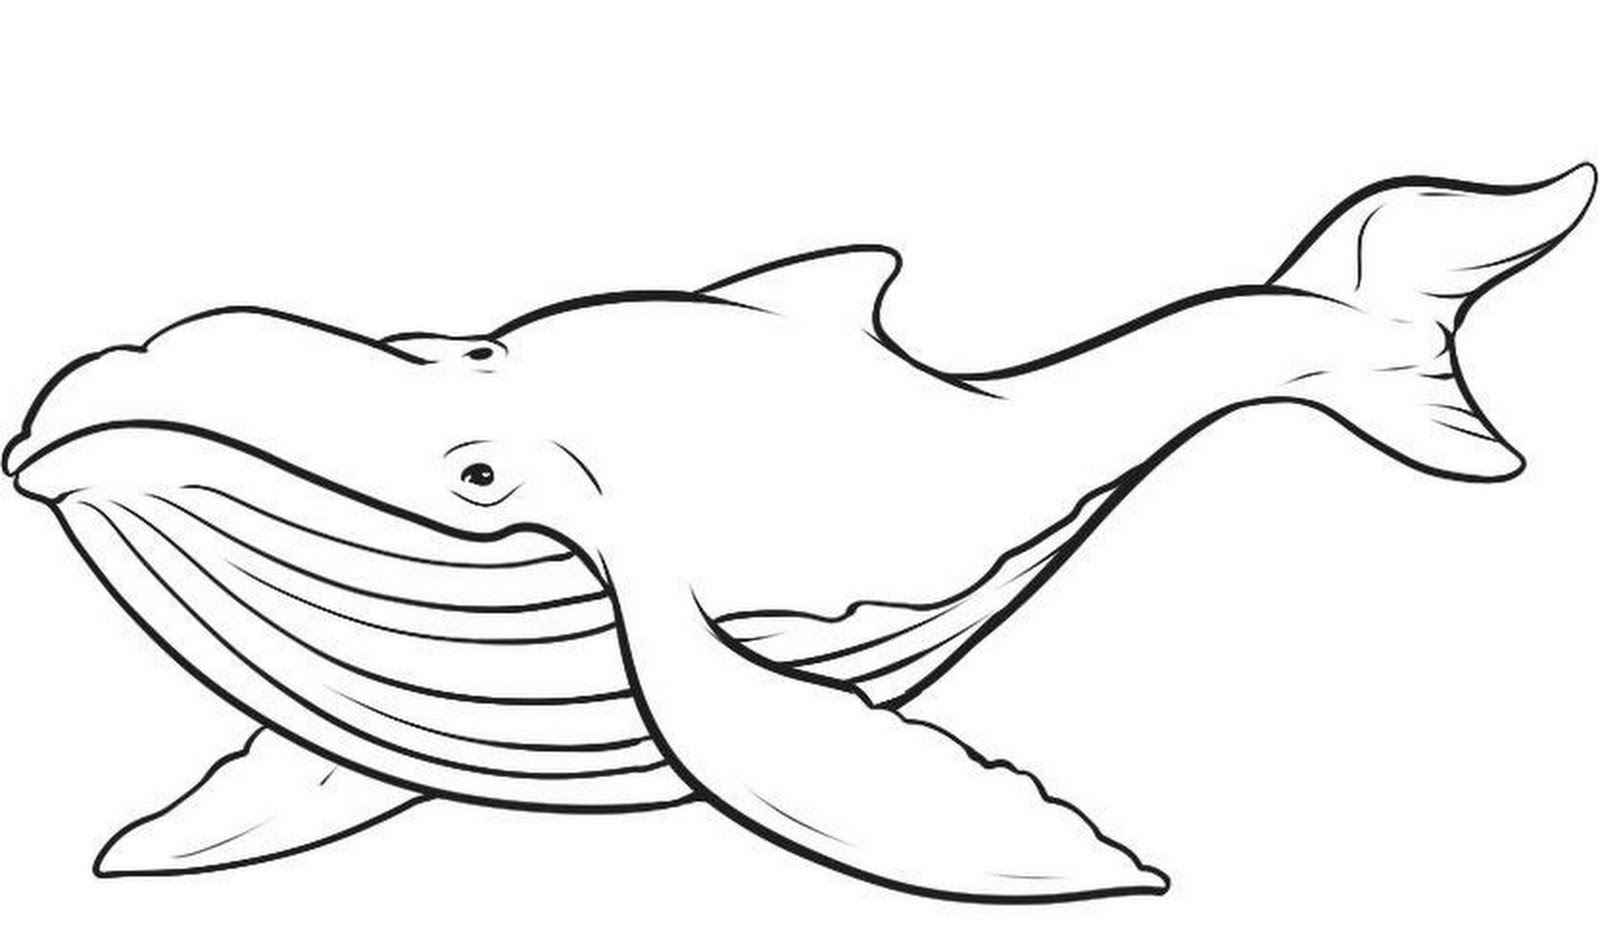 Dessin de baleine gratuit